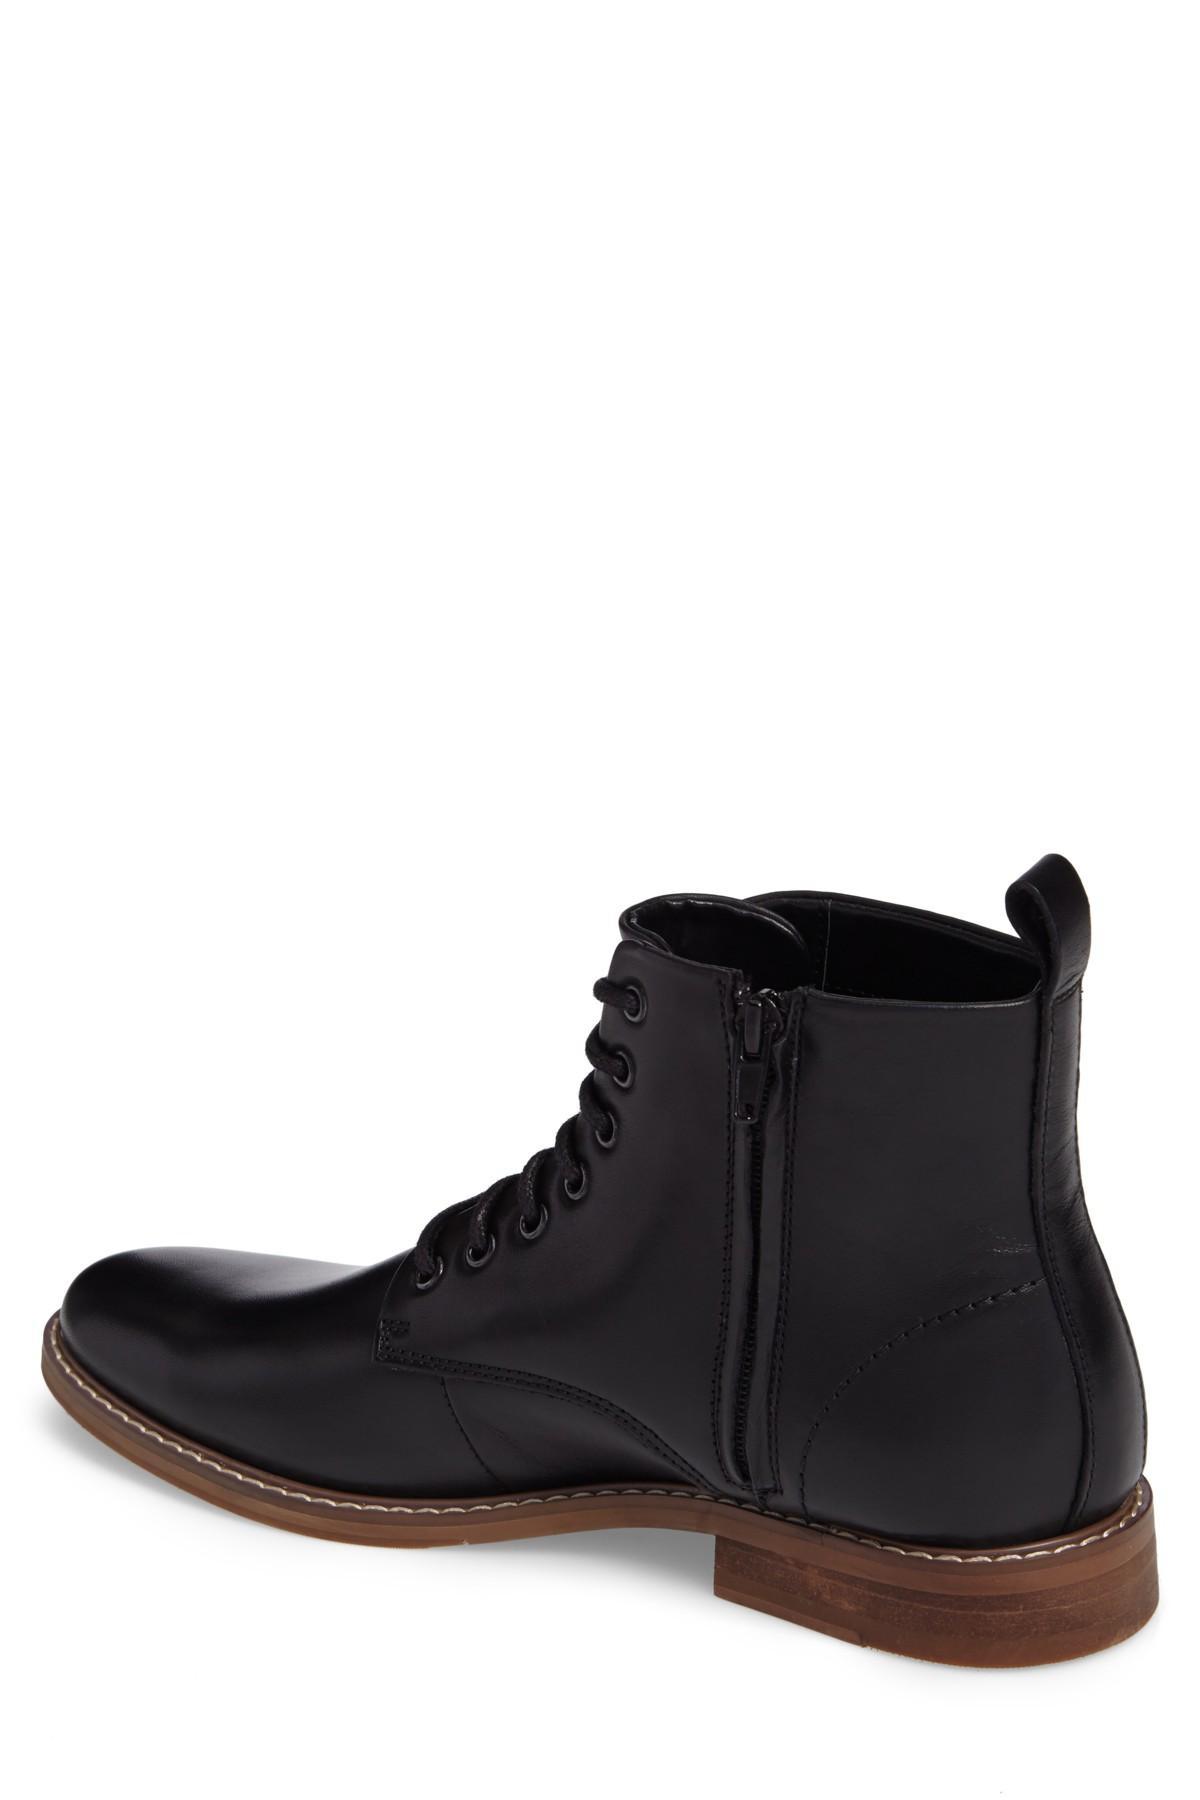 ca2f587bd64 Lyst - The Rail Albany Plain Toe Boot (men) in Black for Men